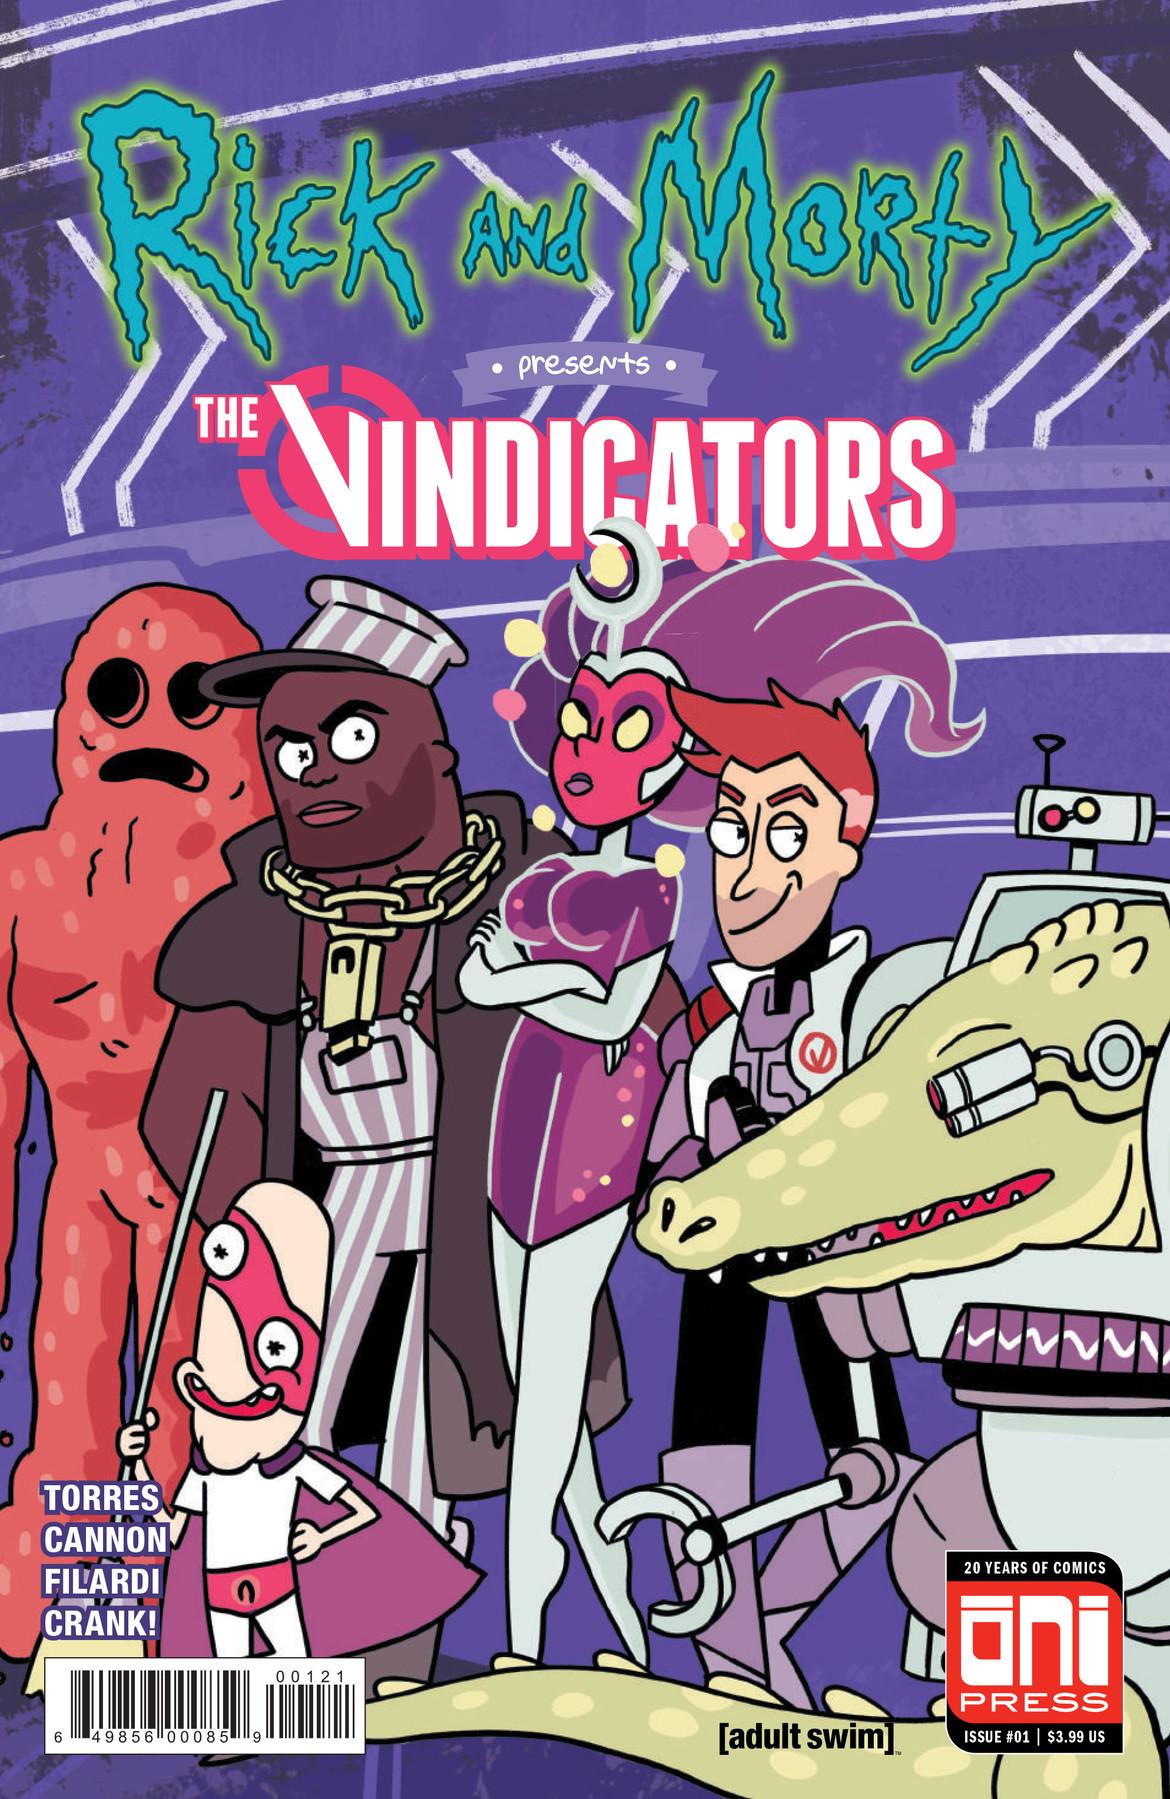 Rick and Morty Presents the Vindicators- Cover Variant